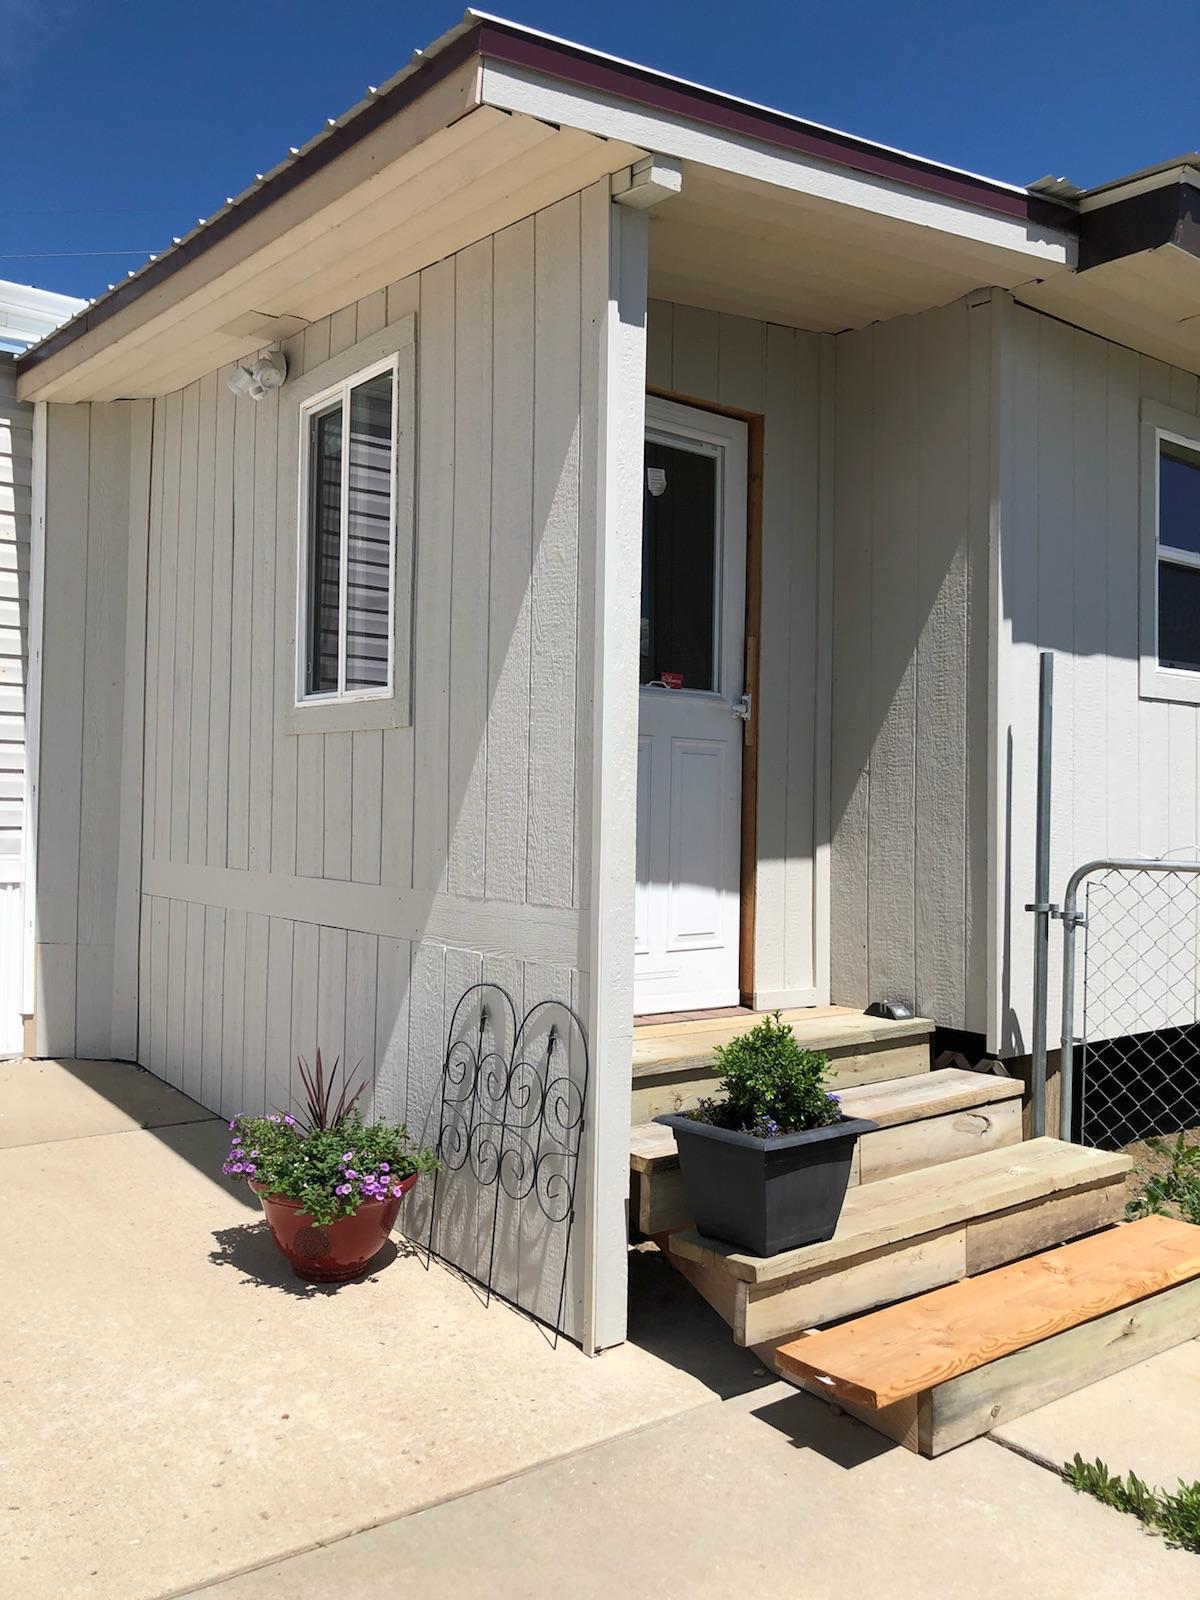 809 Timberline Drive, Sheridan, Wyoming 82801, 3 Bedrooms Bedrooms, ,2 BathroomsBathrooms,Residential,For Sale,Timberline,18-432